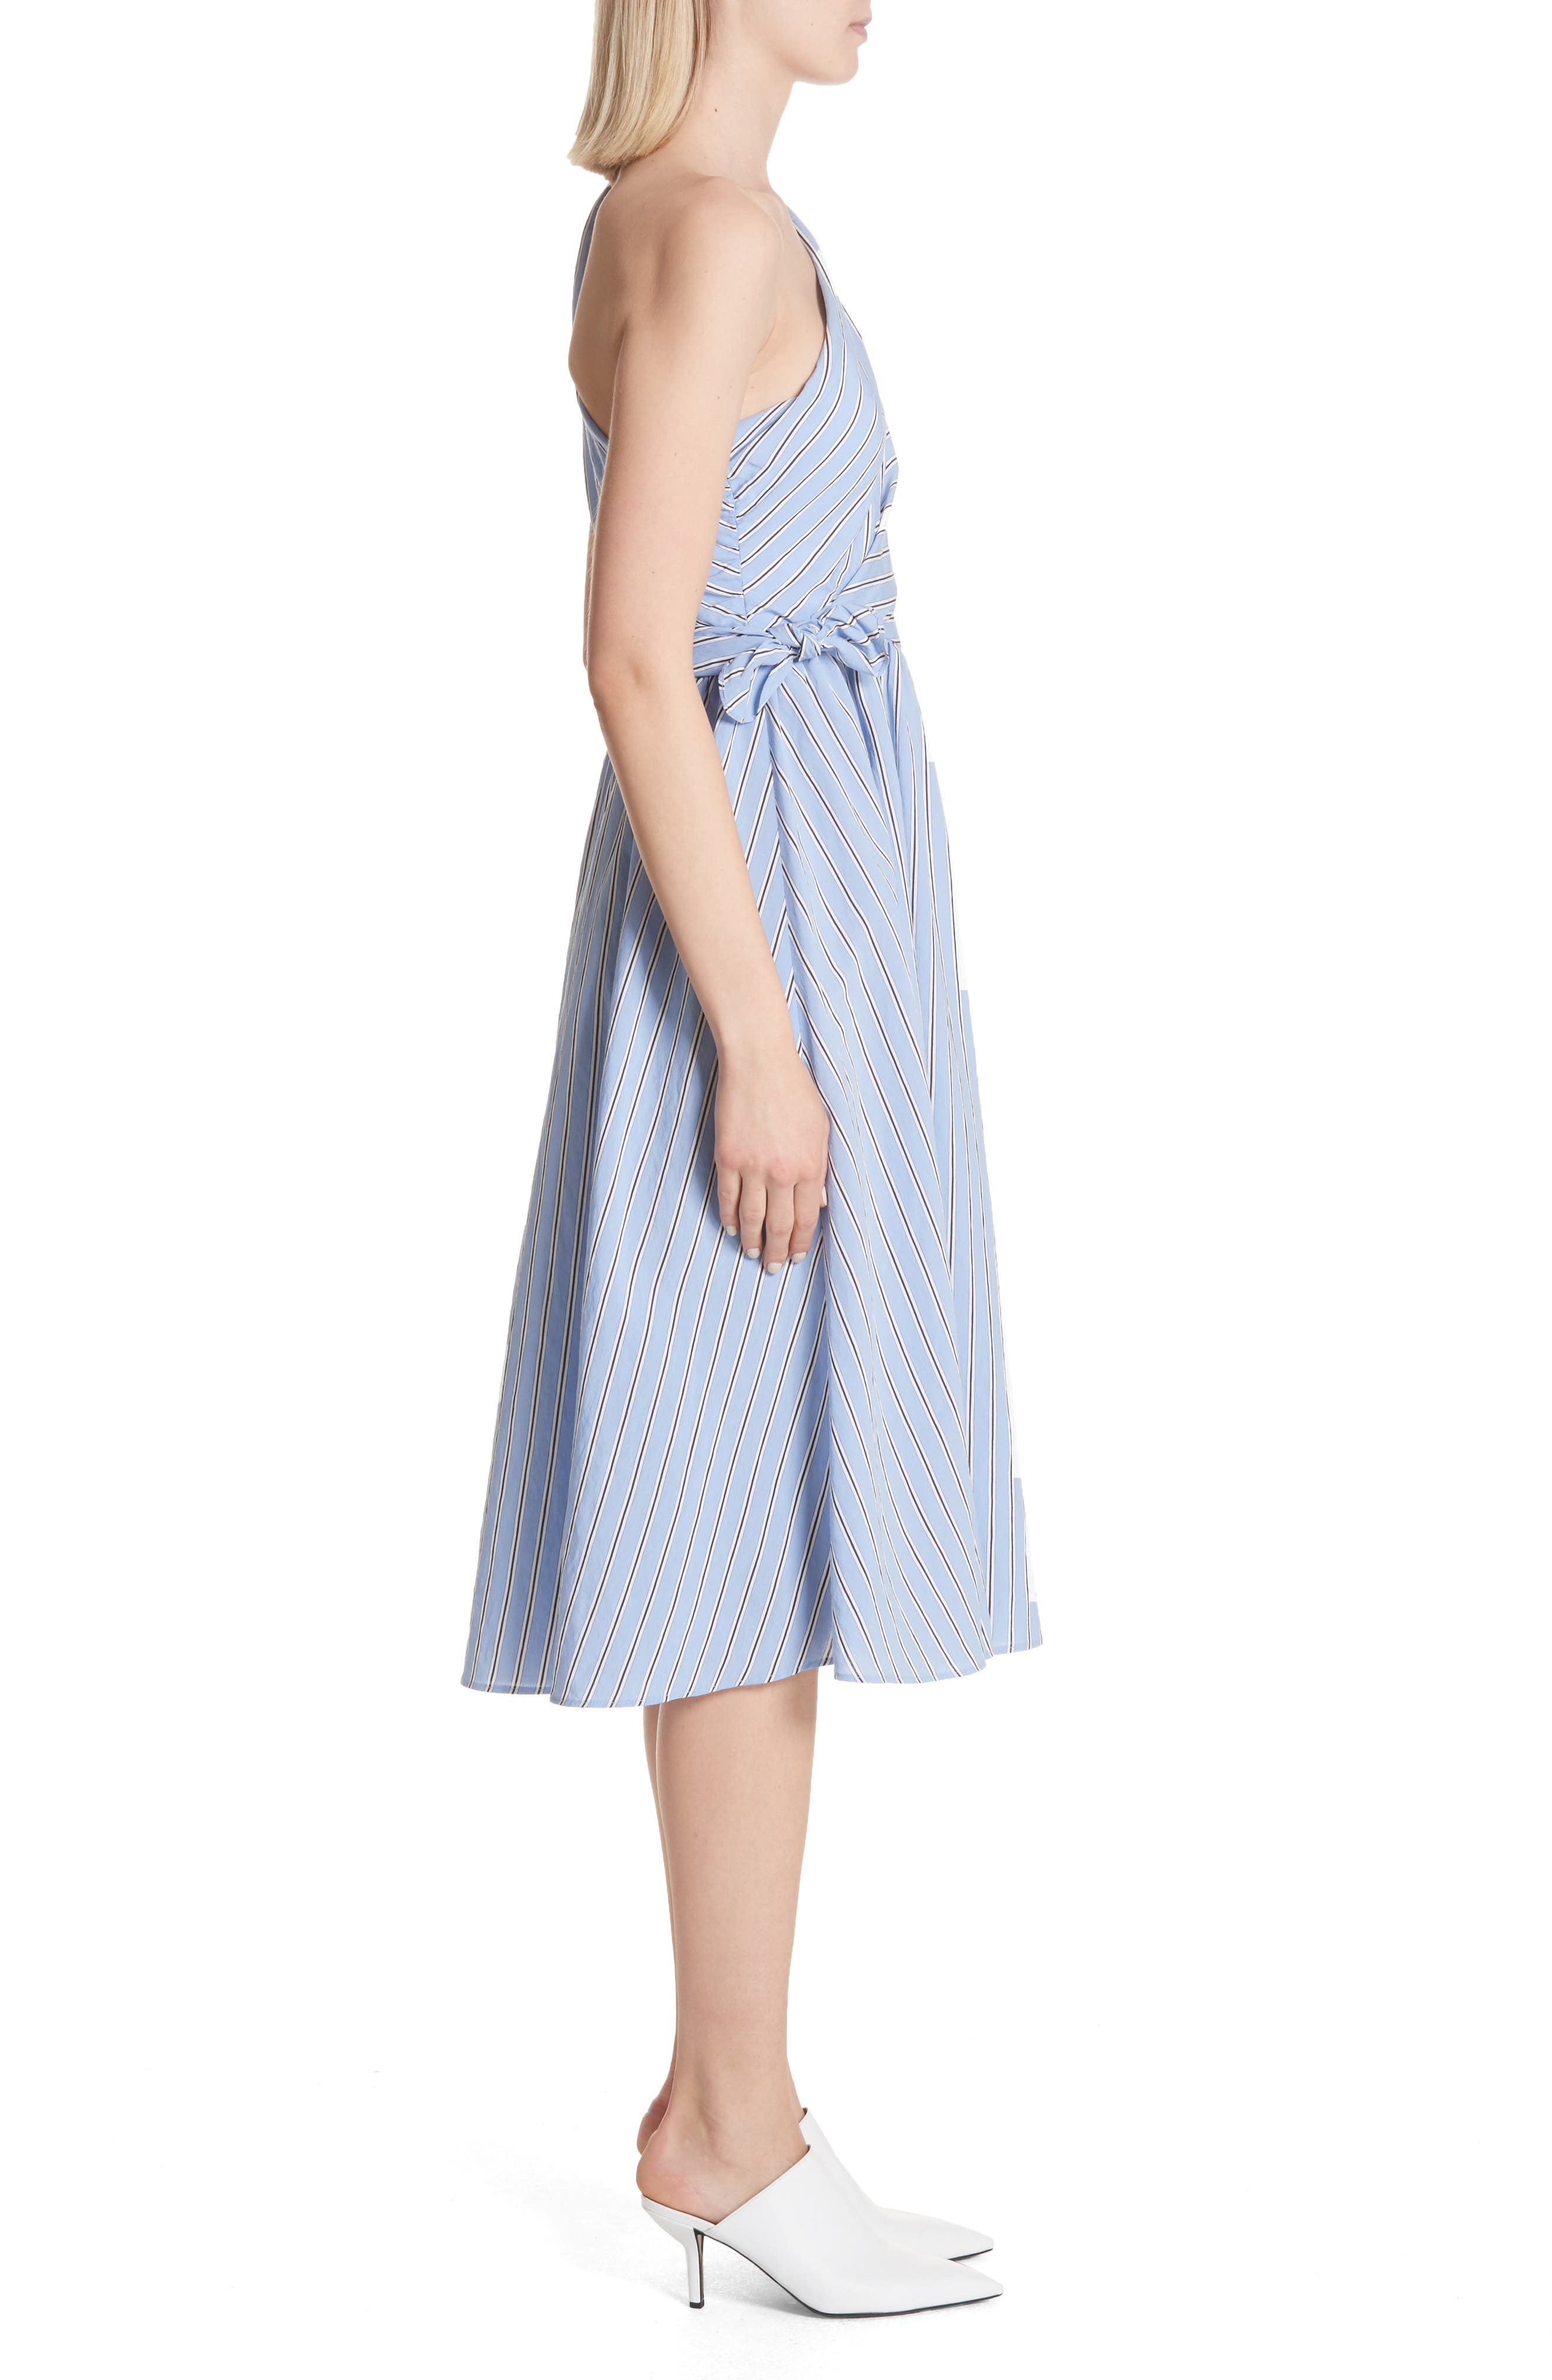 Cabrera Stripe One-Shoulder Dress,                             Alternate thumbnail 3, color,                             Olxford Blue